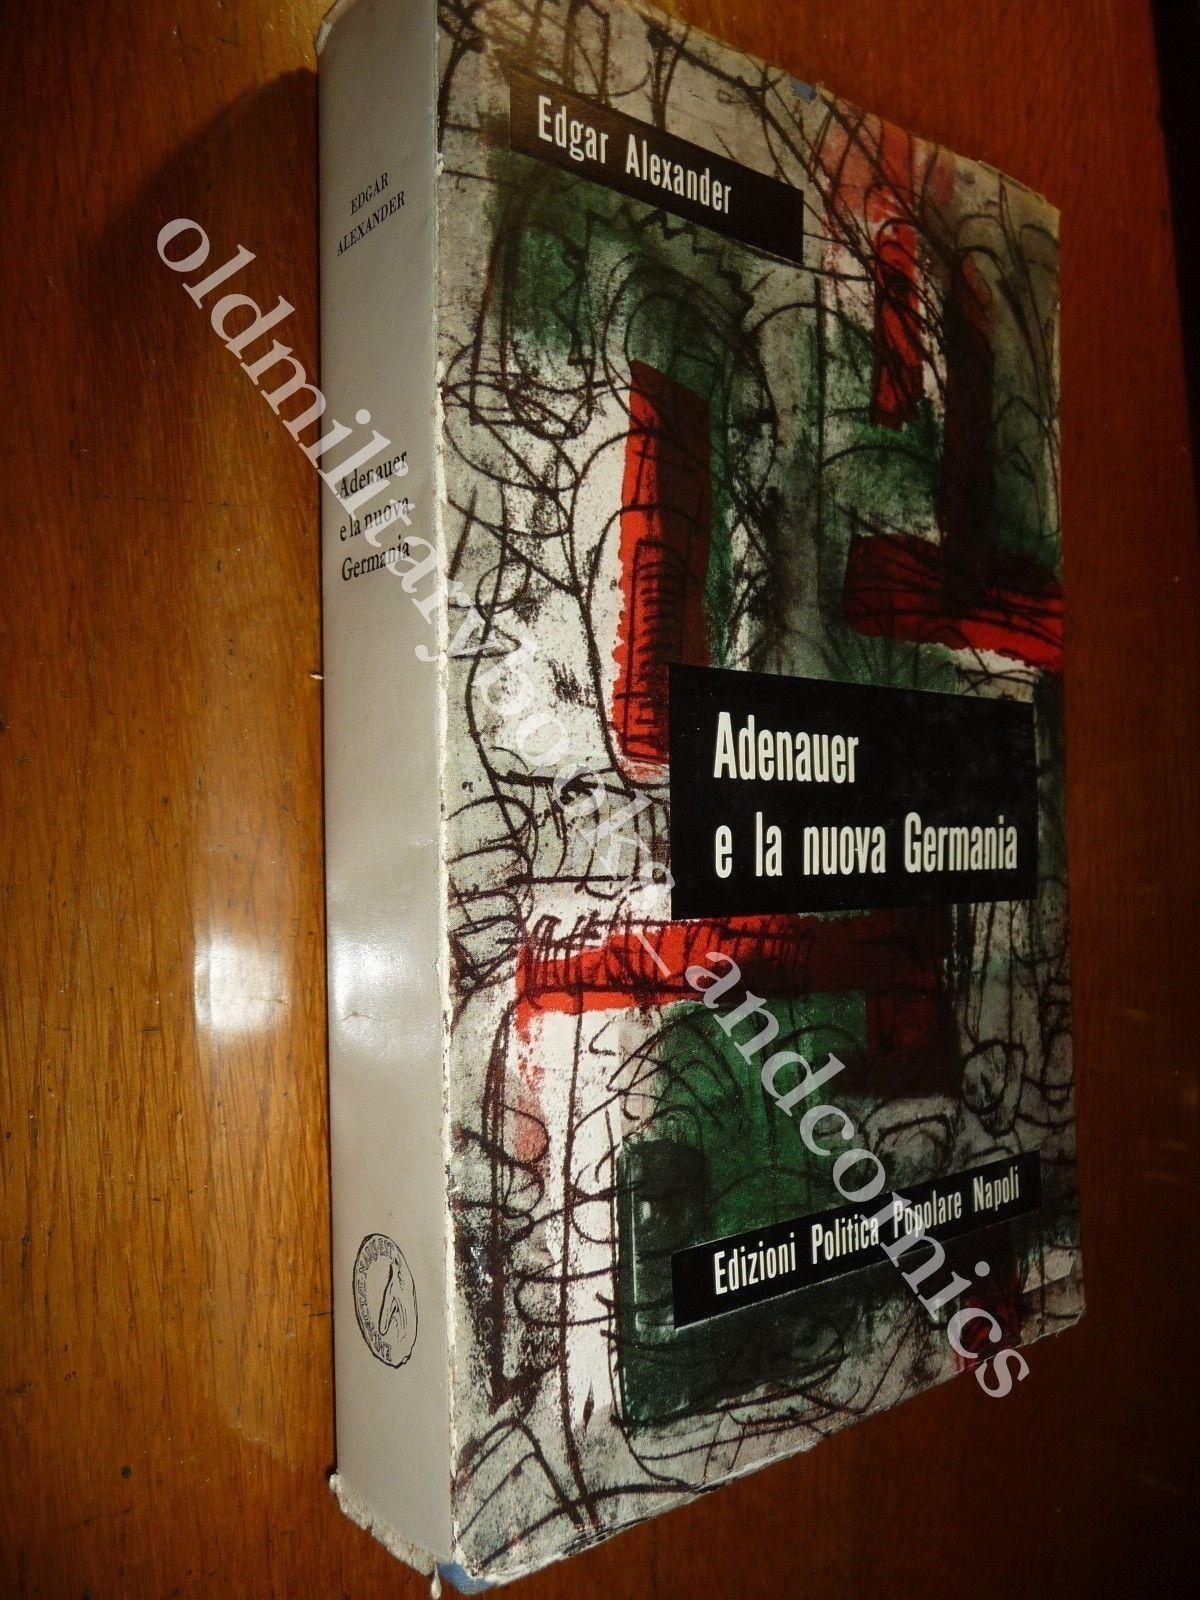 ADENAUER E LA NUOVA GERMANIA EDGAR ALEXANDER PREF. LUIGI STURZO PERFETTO STATO